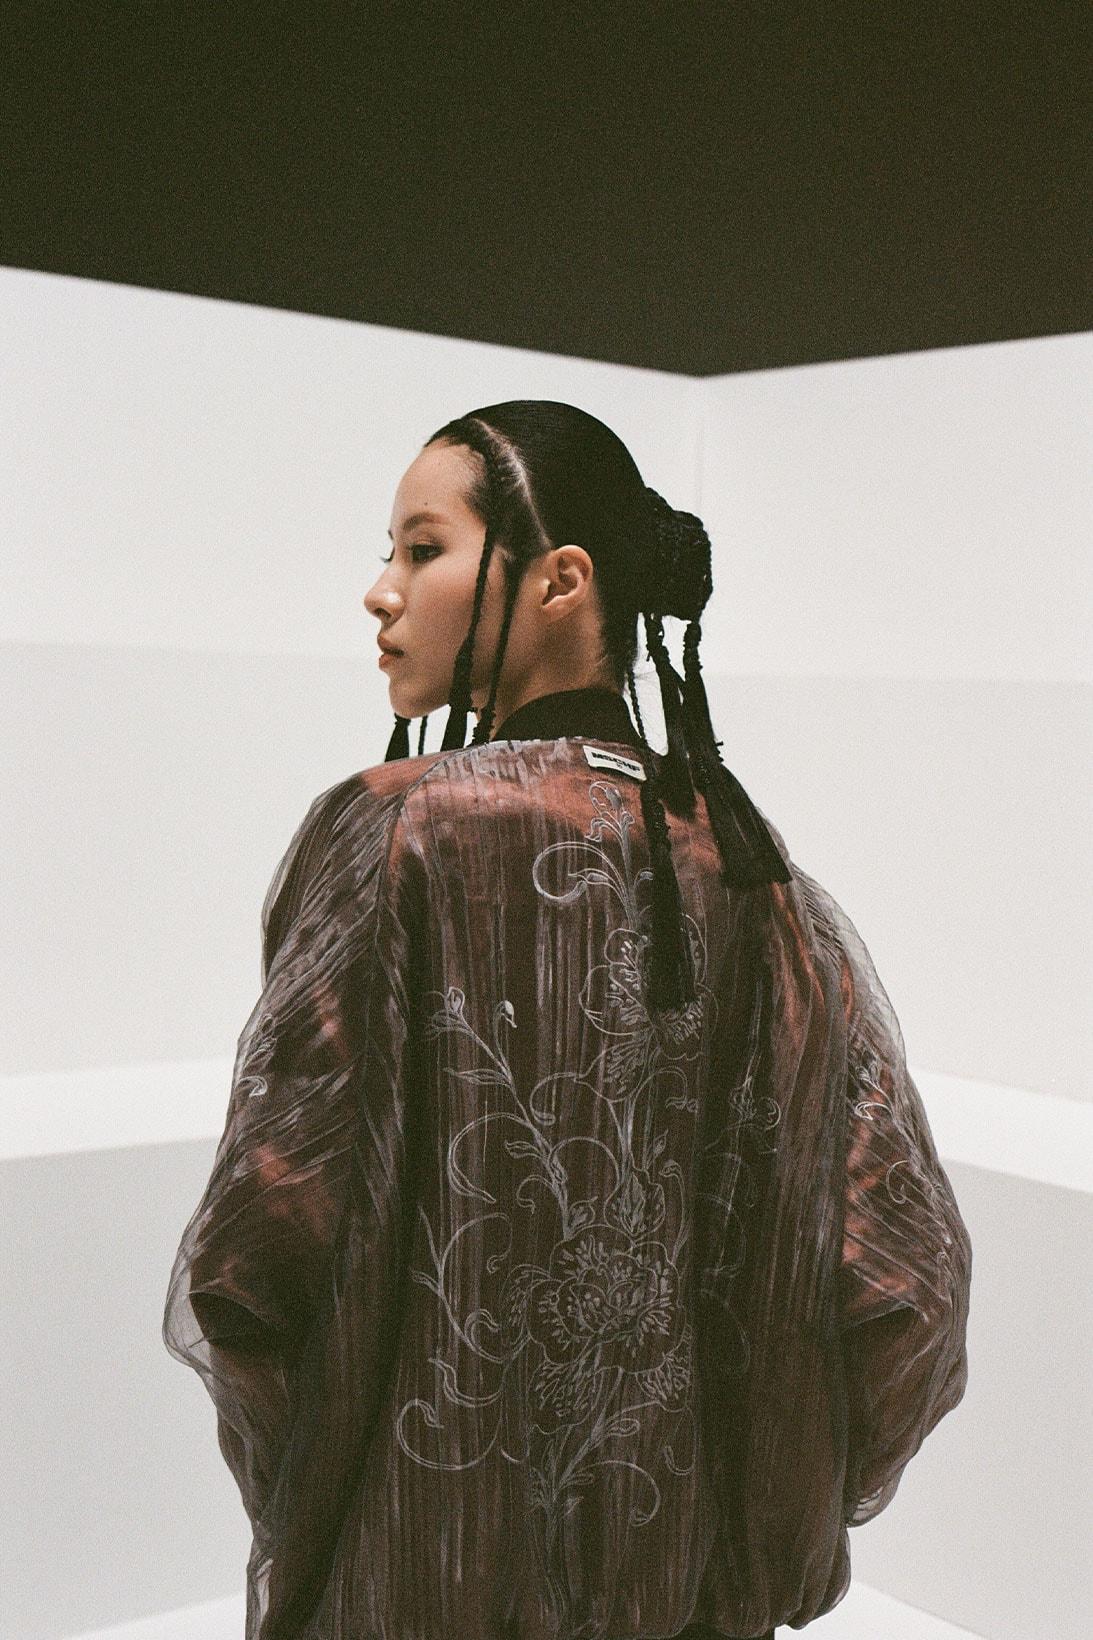 mischief mschf lim kim project mago nike music video single international womens day release watch listen